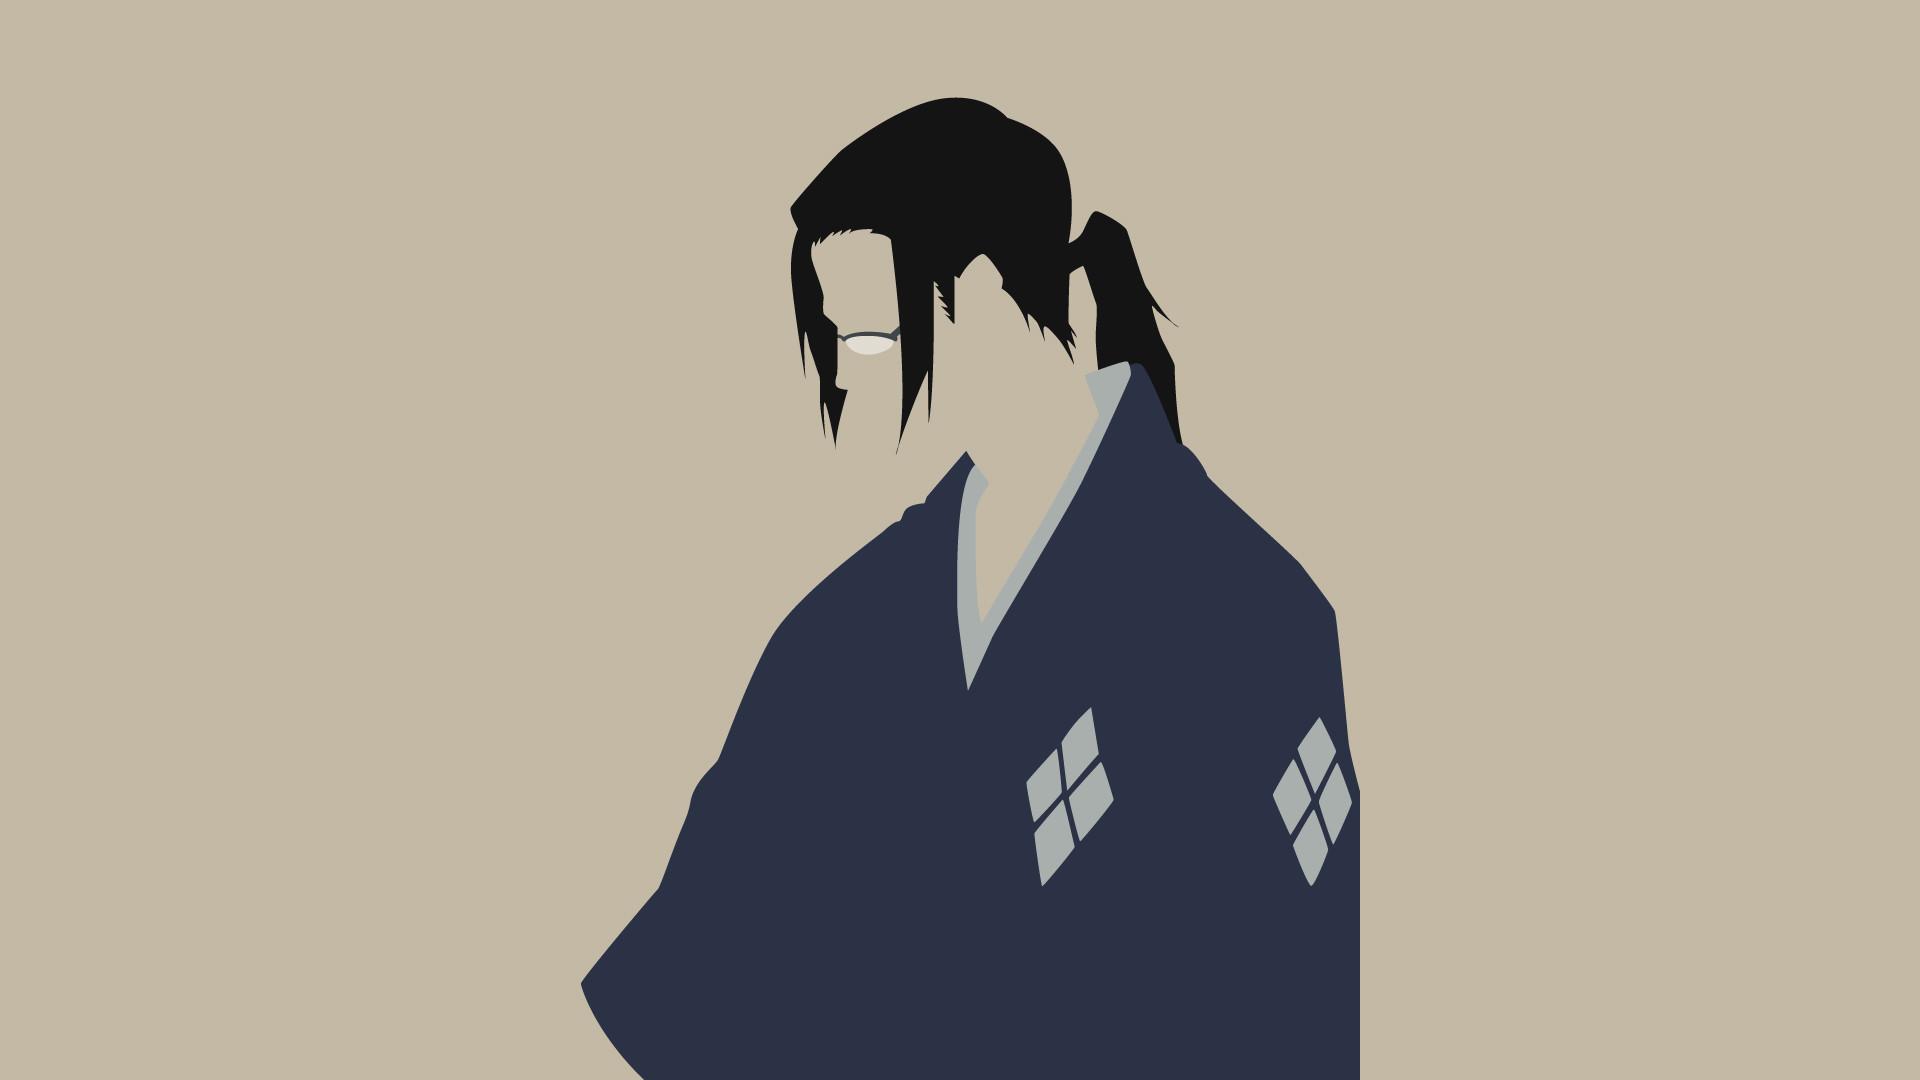 Jin Samurai Champloo HQ Background Wallpaper 24450